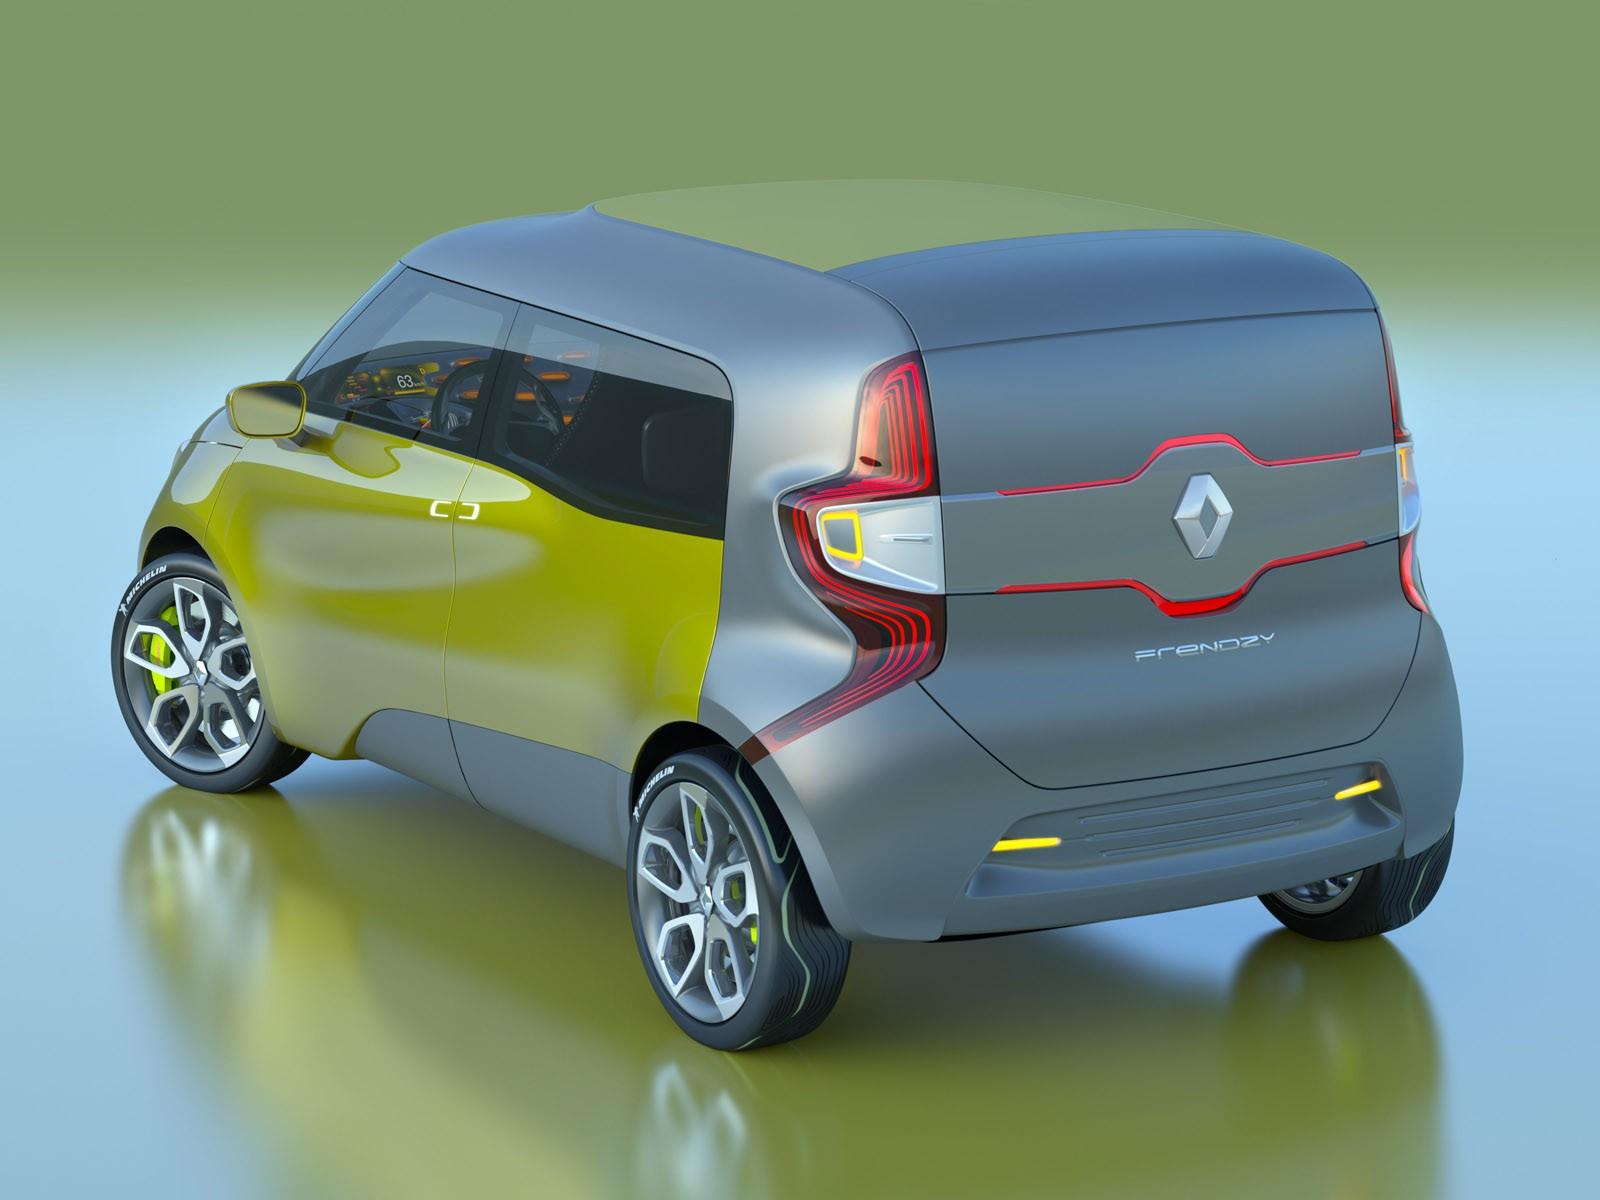 2011 Renault Frendzy Concept